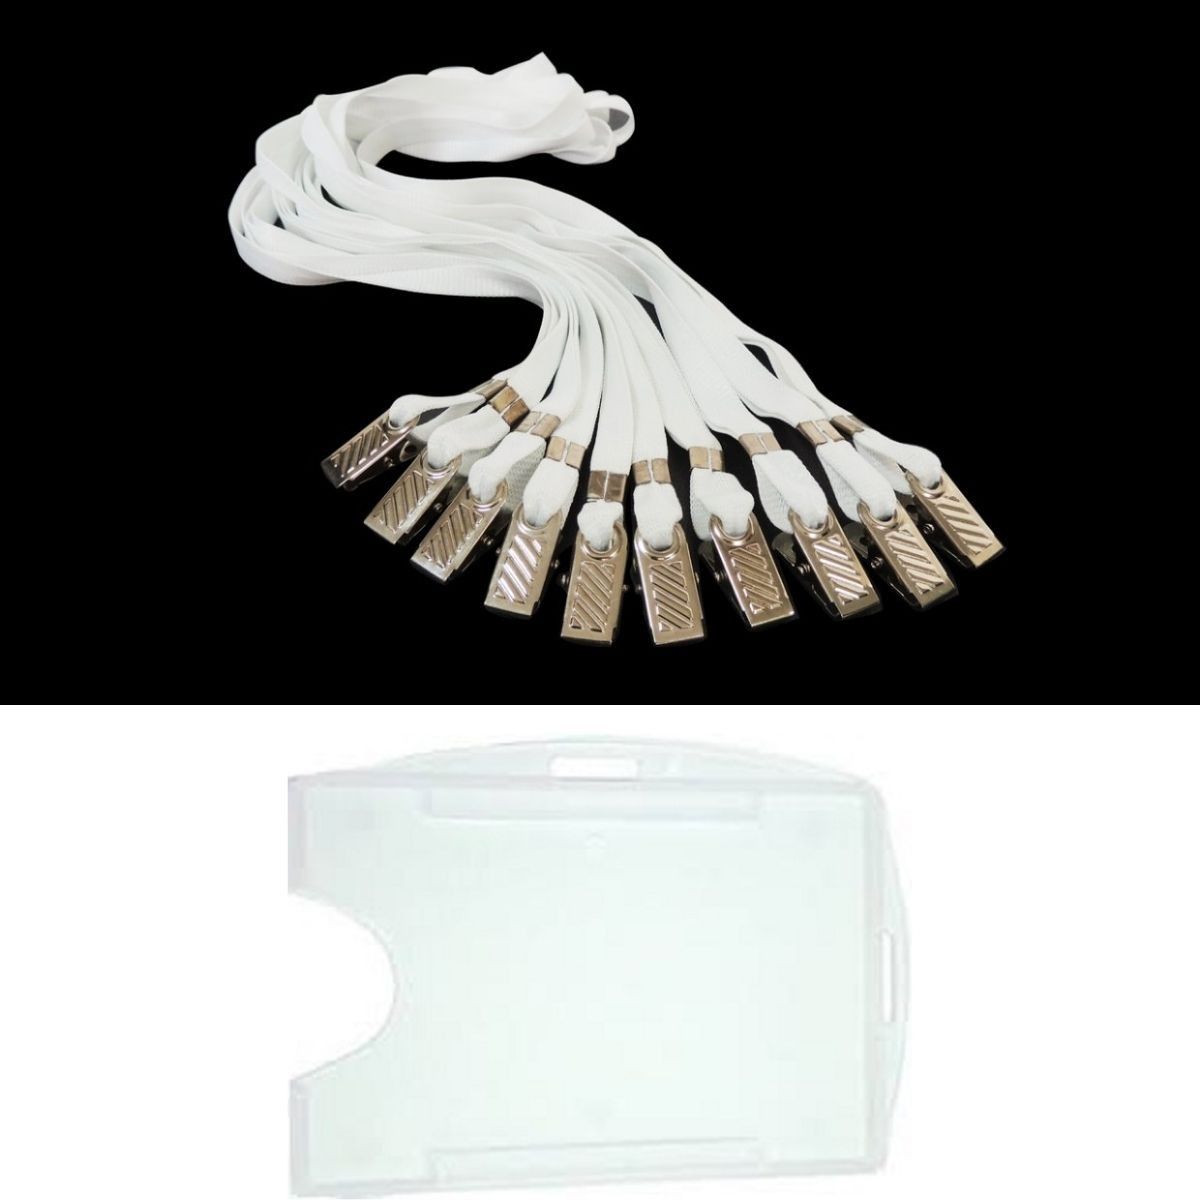 Kit Porta Crachá Rígido Conjugado Cristal + Cordão Branco - 100 unidades  - Click Suprimentos